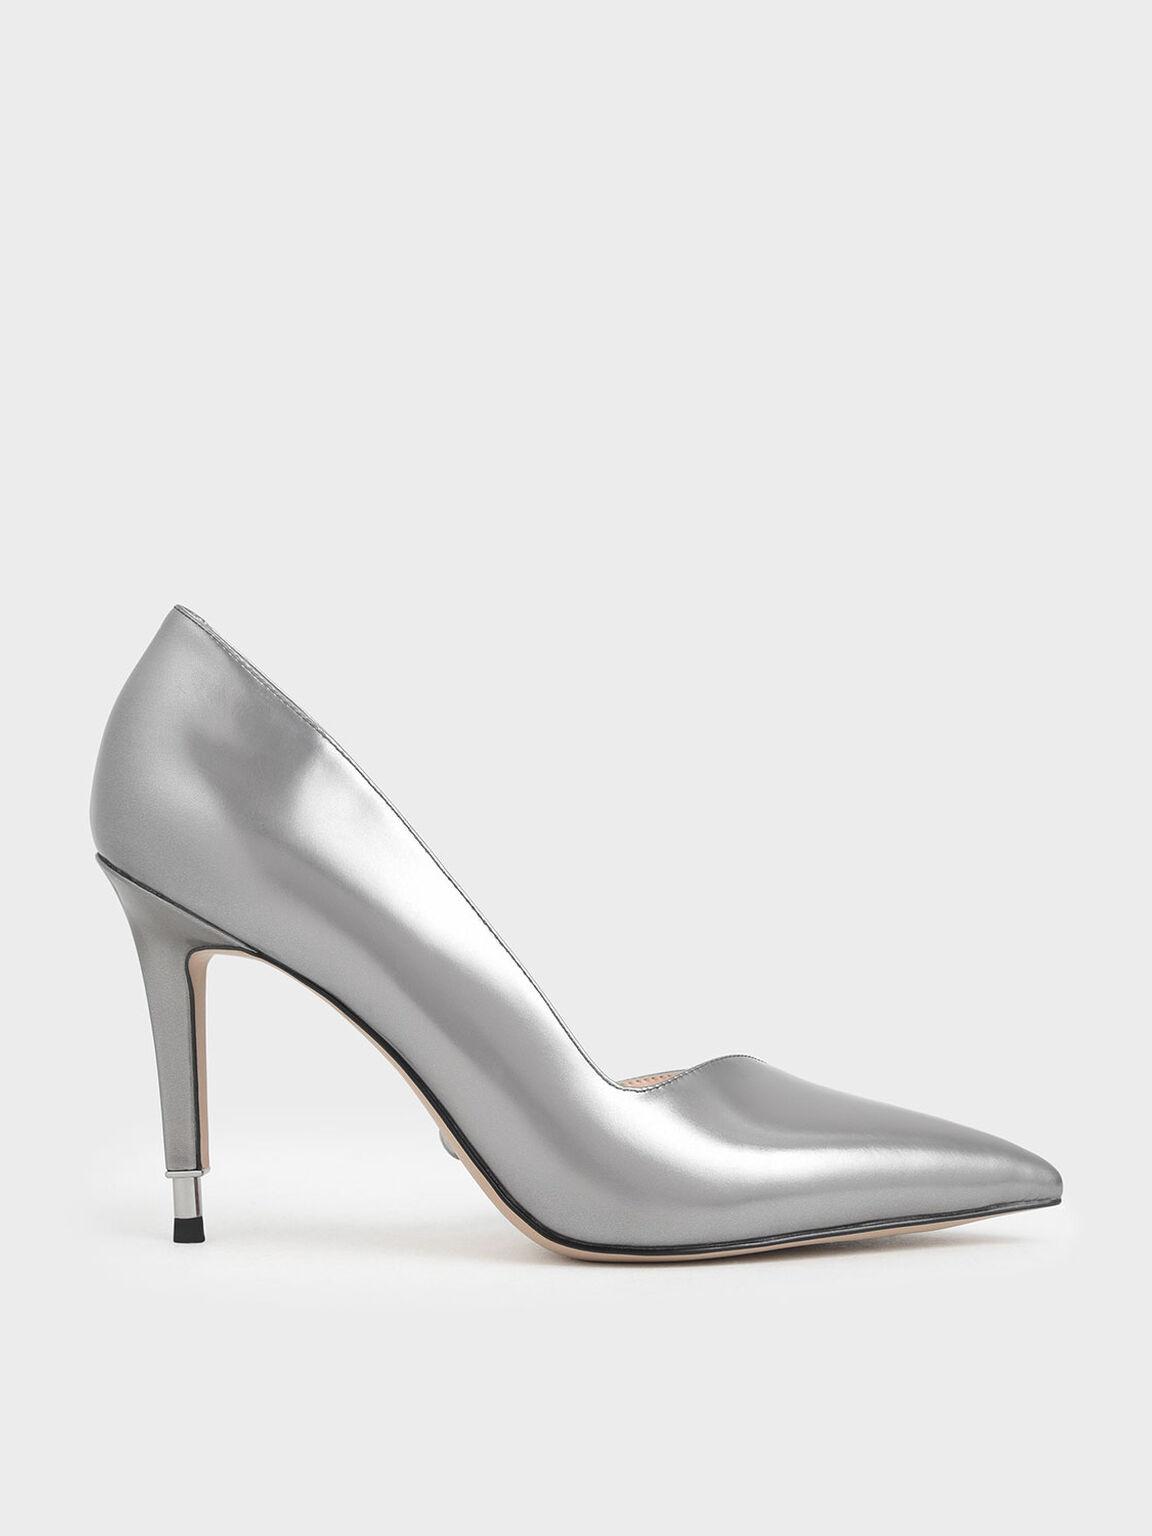 Metallic Leather D'Orsay Pumps, Silver, hi-res